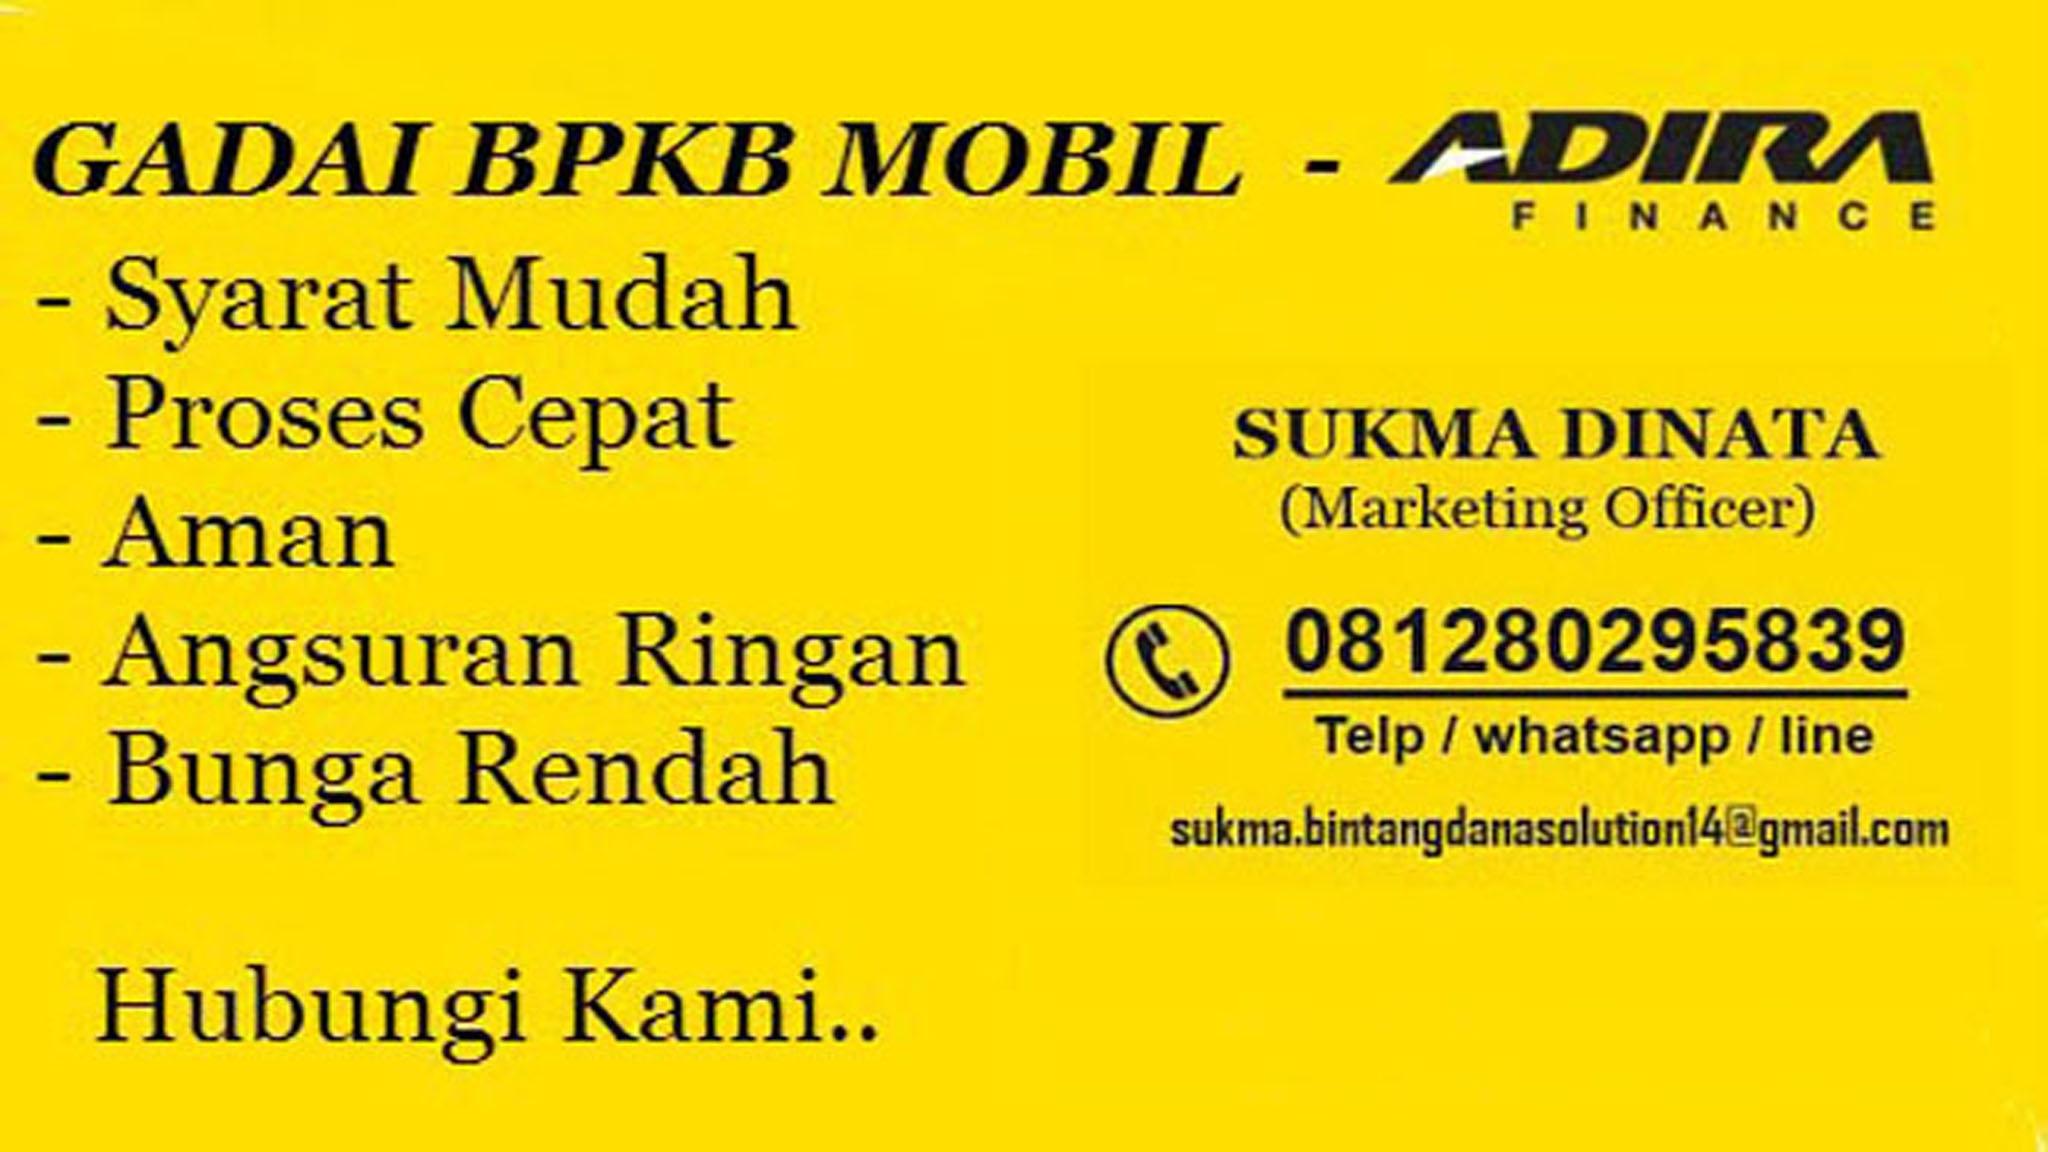 Gadai BPKB Mobi (@kreditpinjamandana) Cover Image